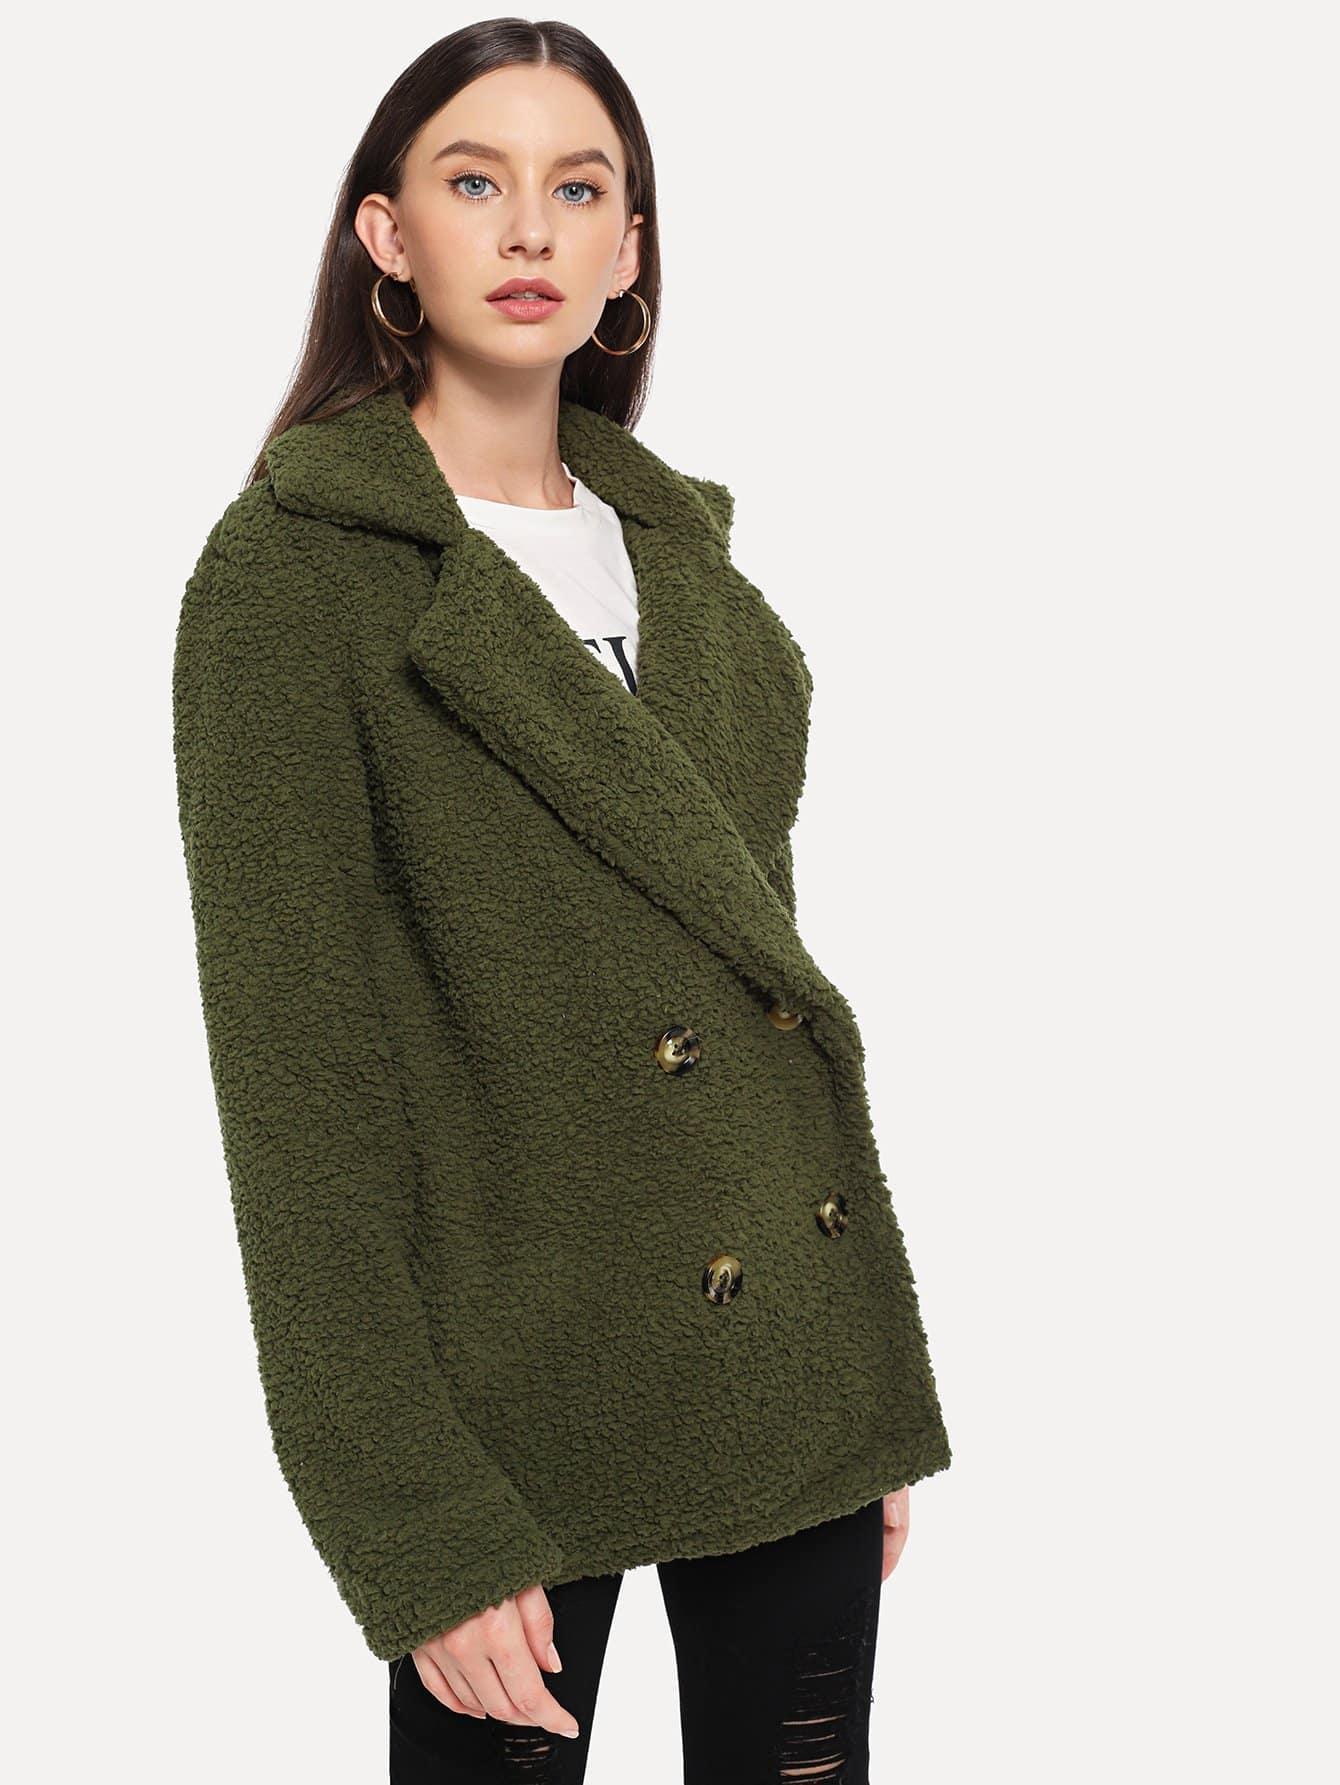 Фото - Двубортное однотонное пальто тедди от SheIn цвет цвета хаки